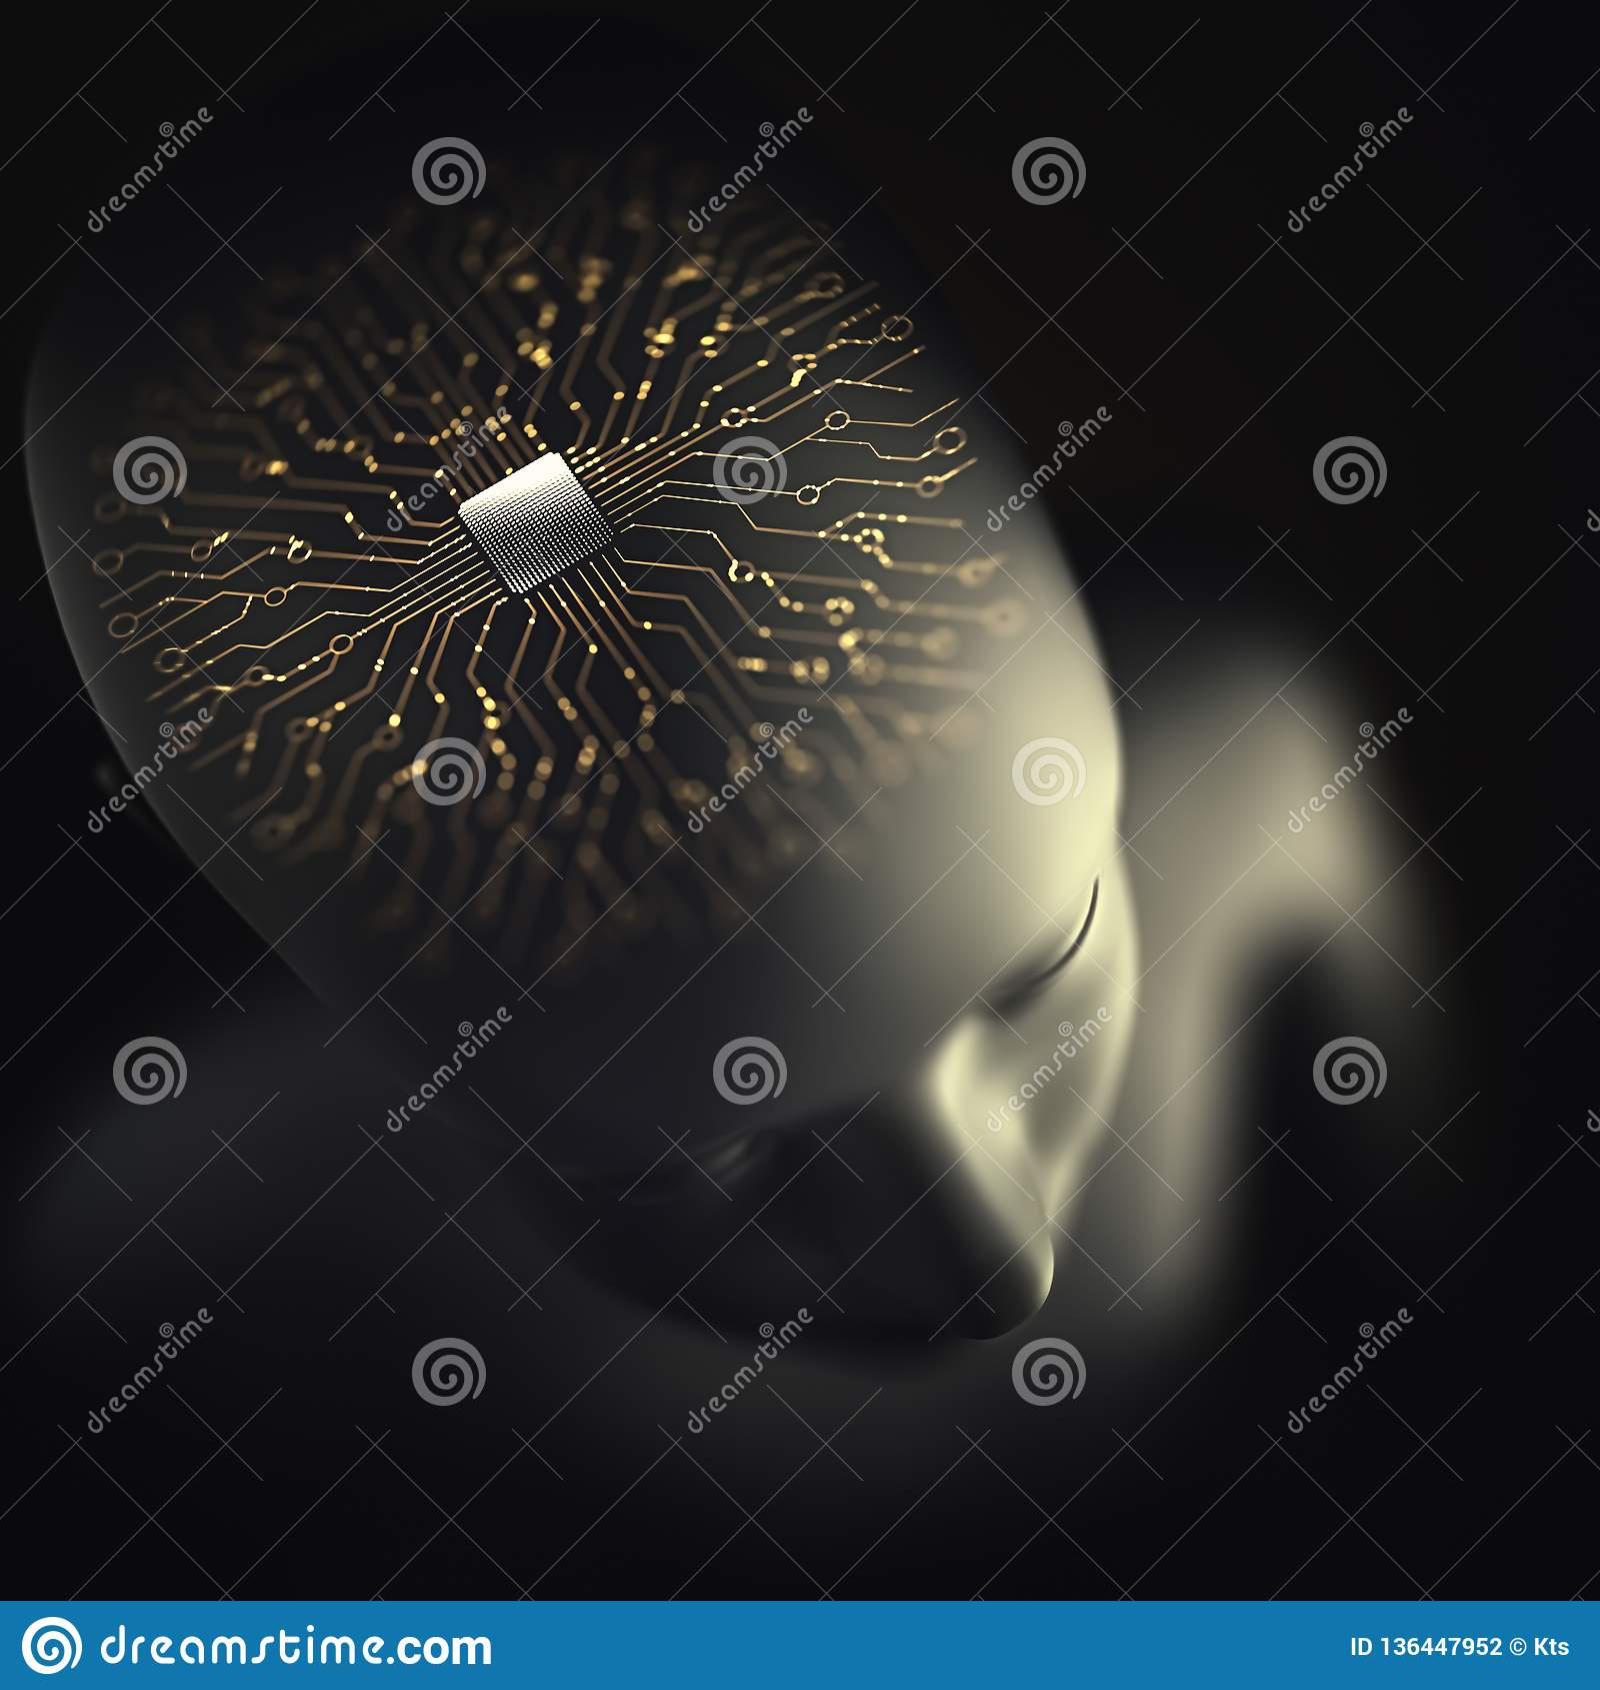 Artificial Intelligence Brain Microprocessor Nervous System